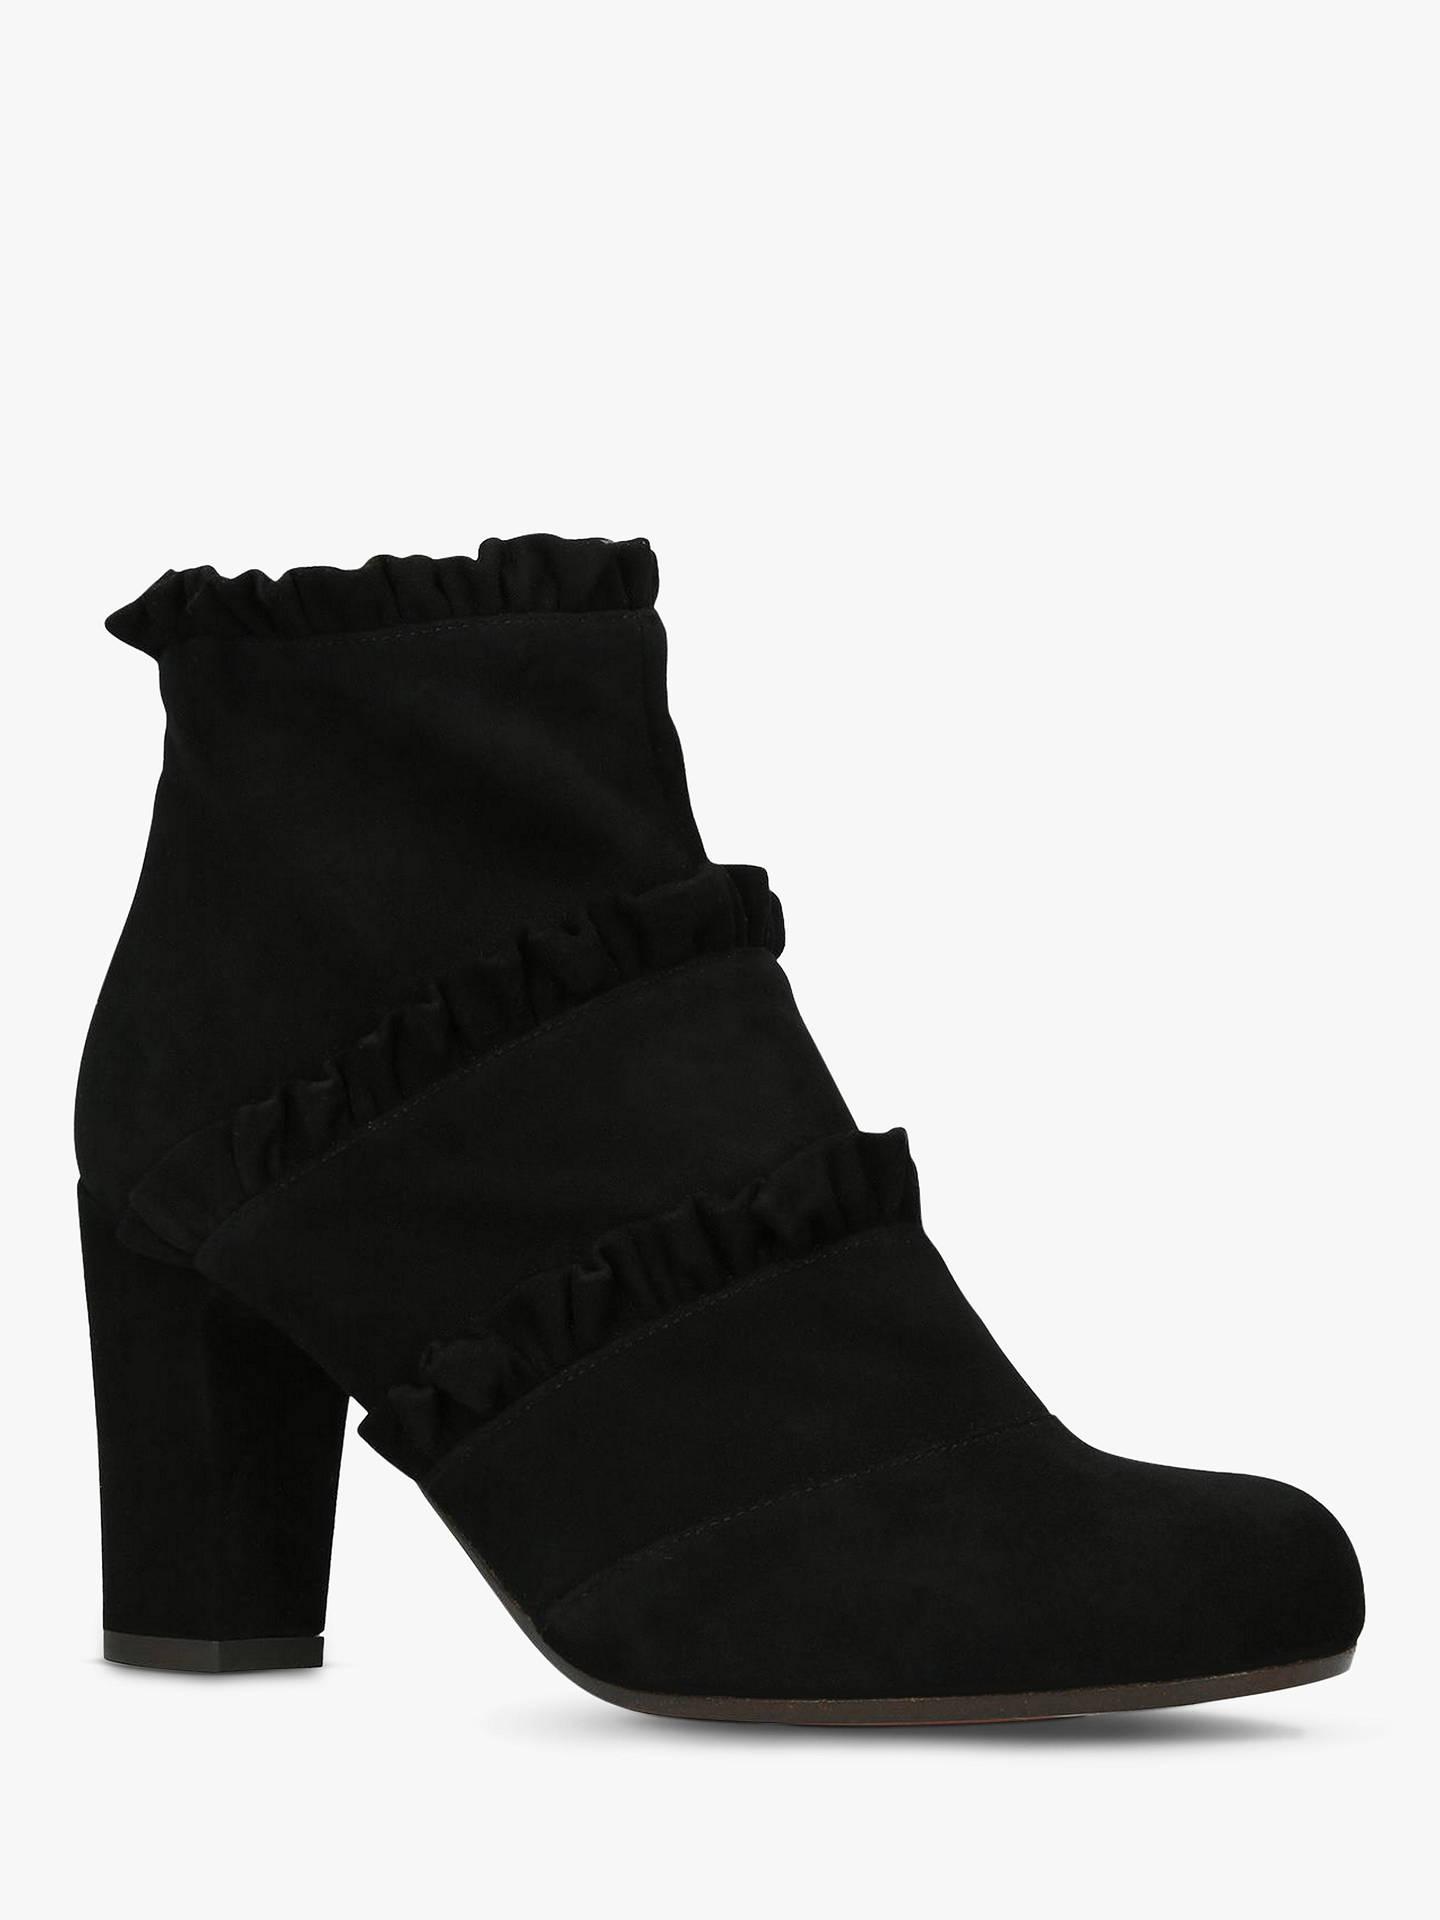 e23cf6d3edff ... Buy Chie Mihara Kaftan Ruffle Block Heel Ankle Boots